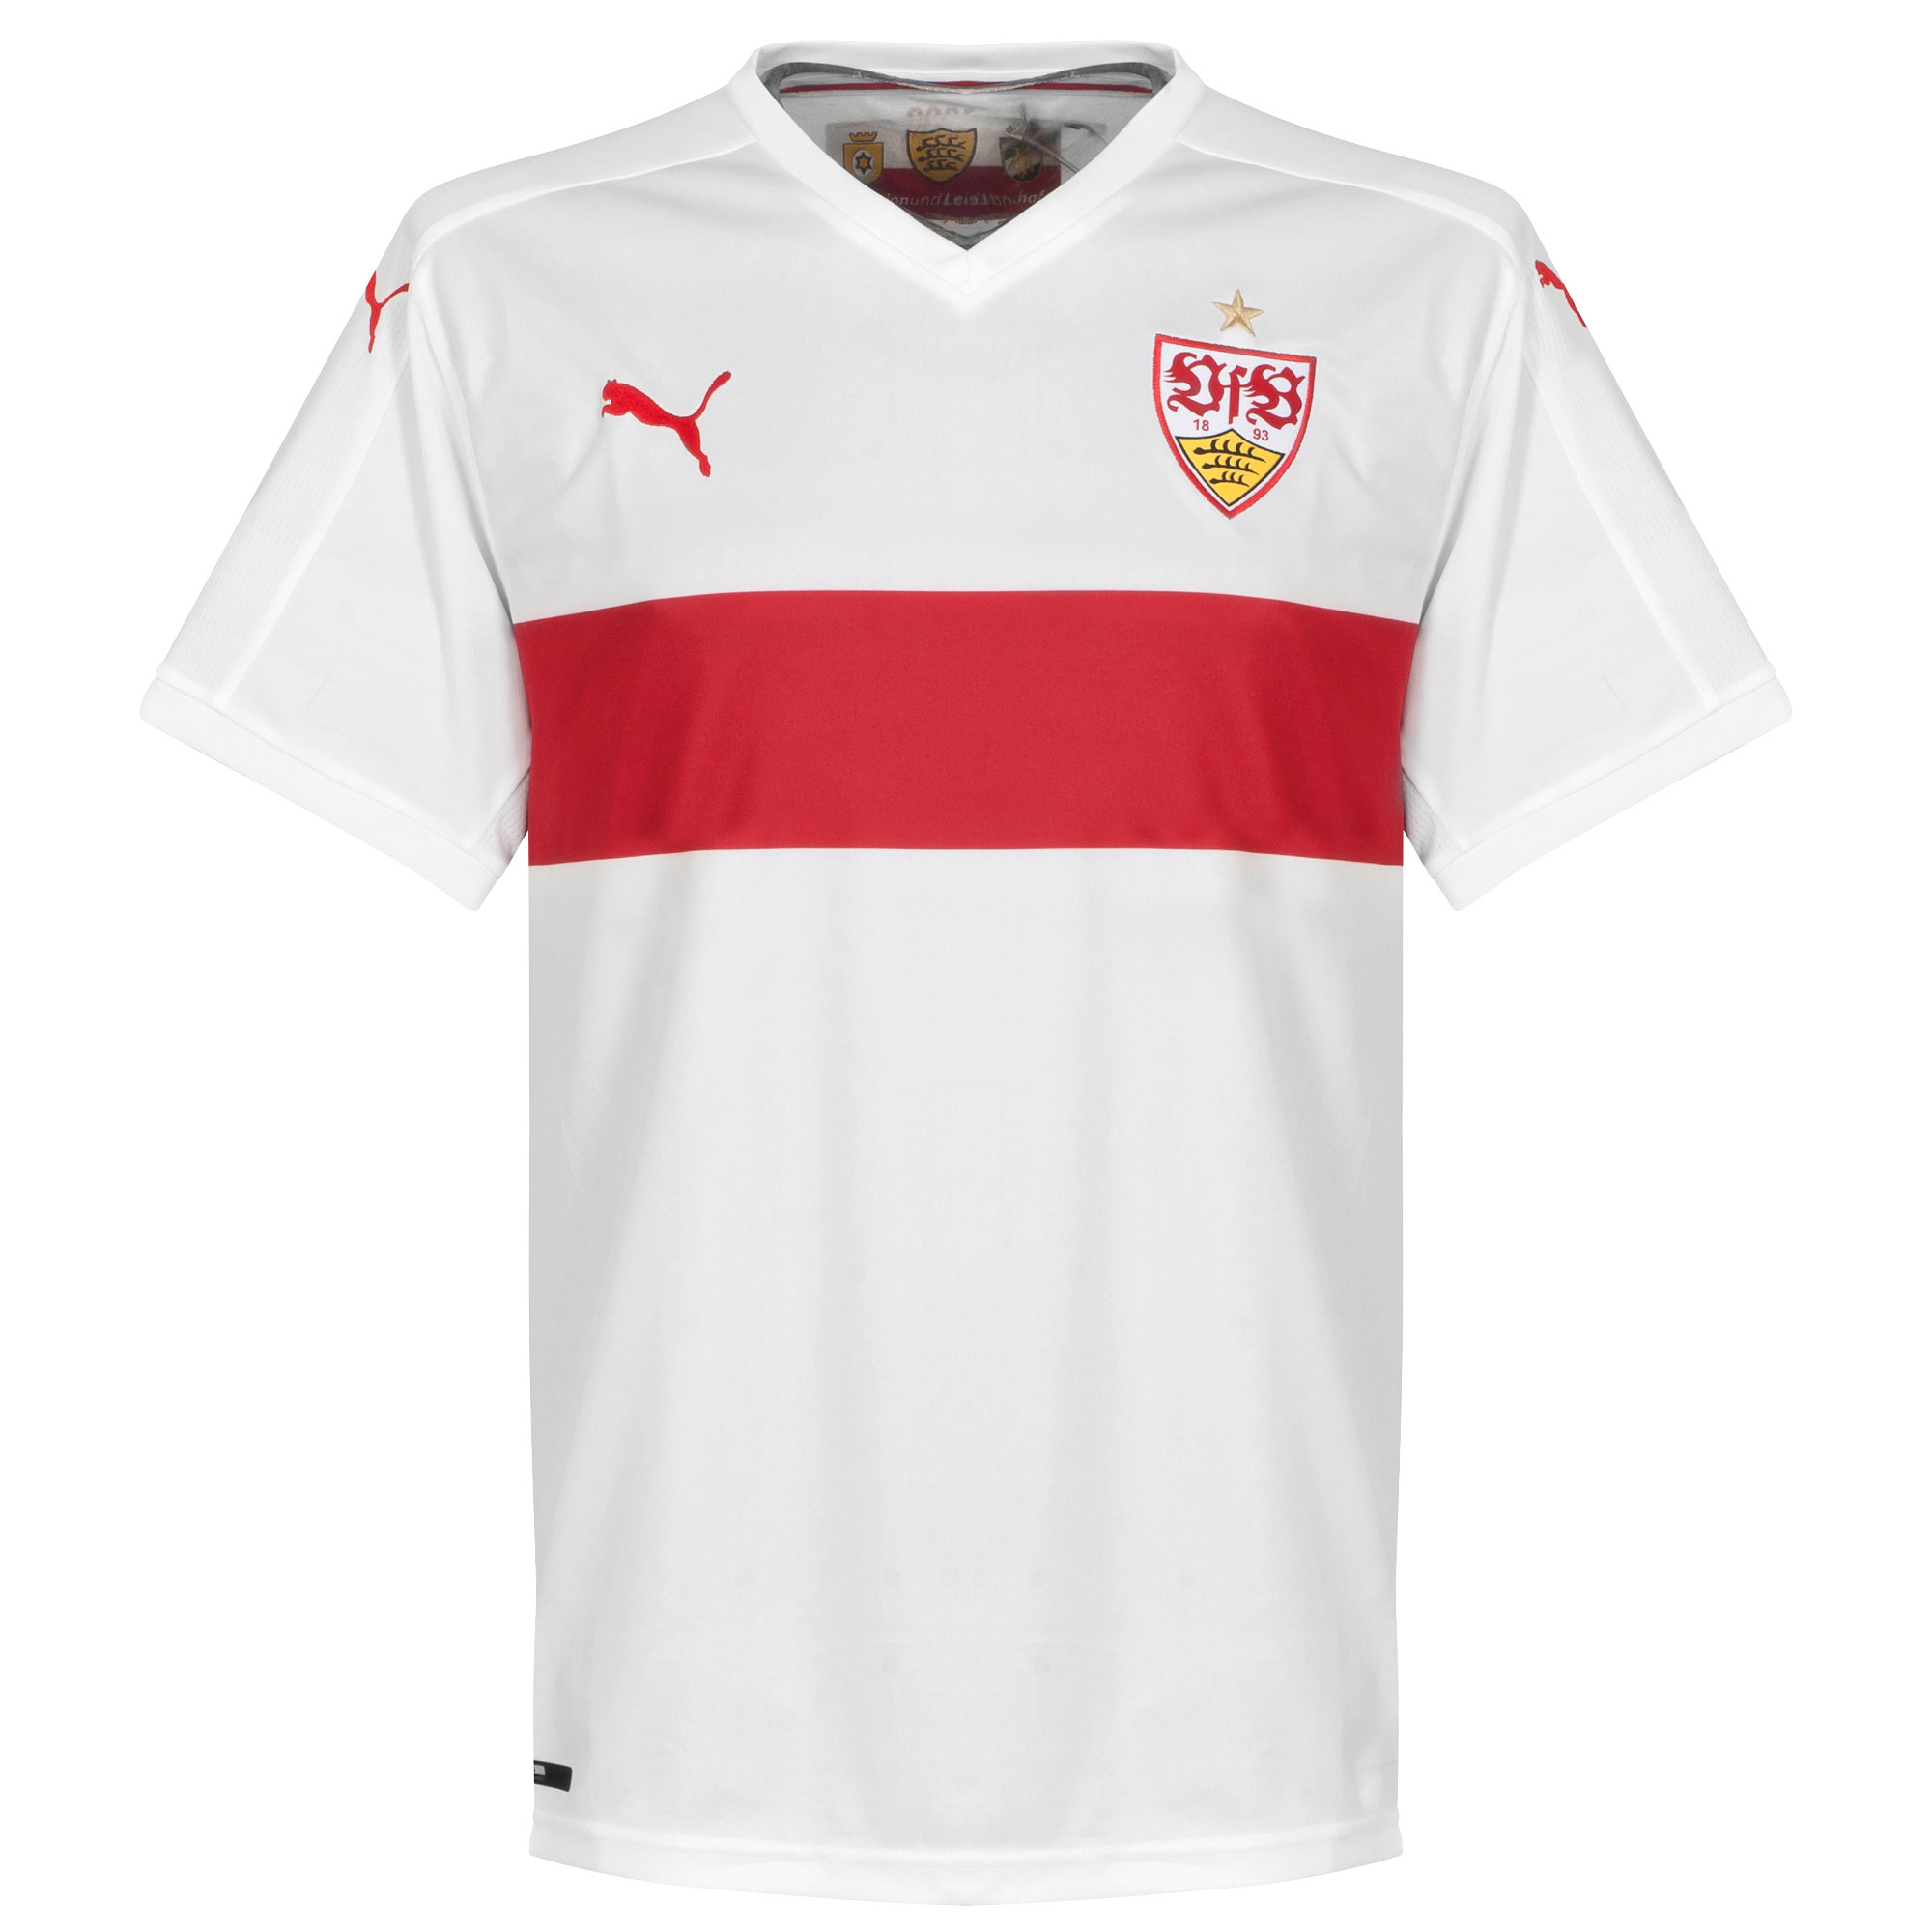 VFB Stuttgart Home Players Jersey 2015 / 2016 - Unsponsored - S